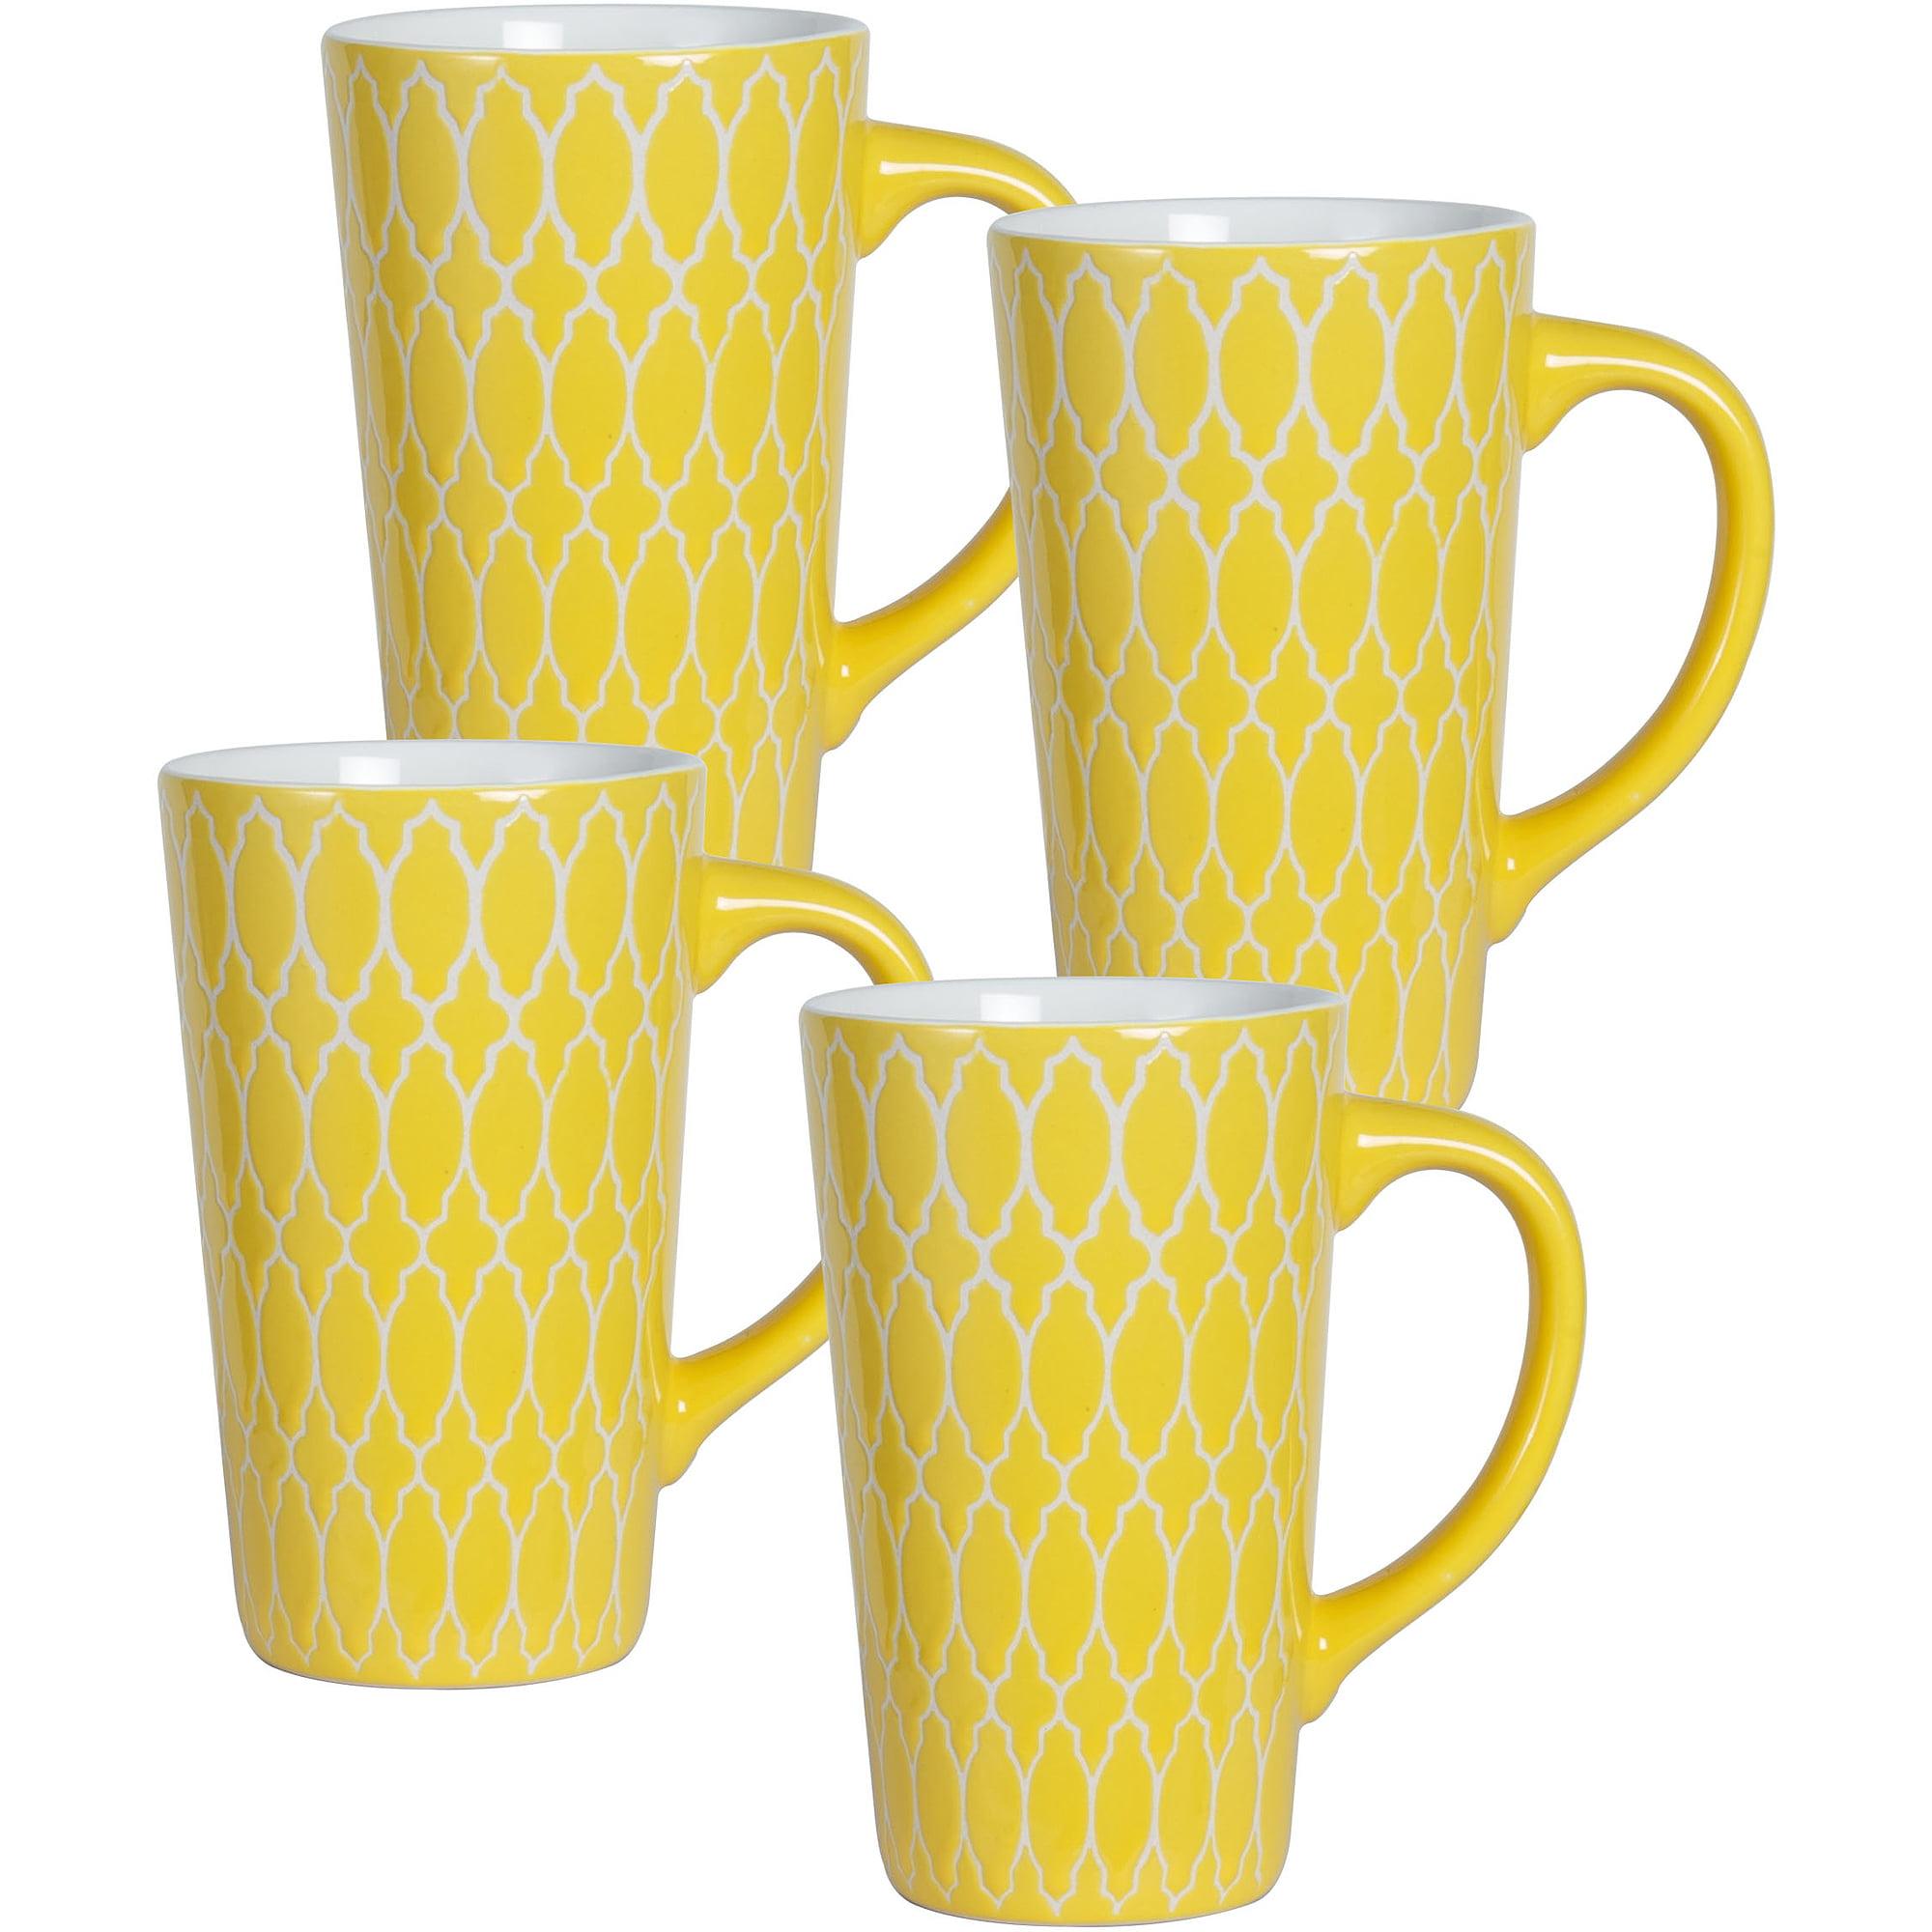 Pfaltzgraff Studio Set of 4 Mugs, Yellow